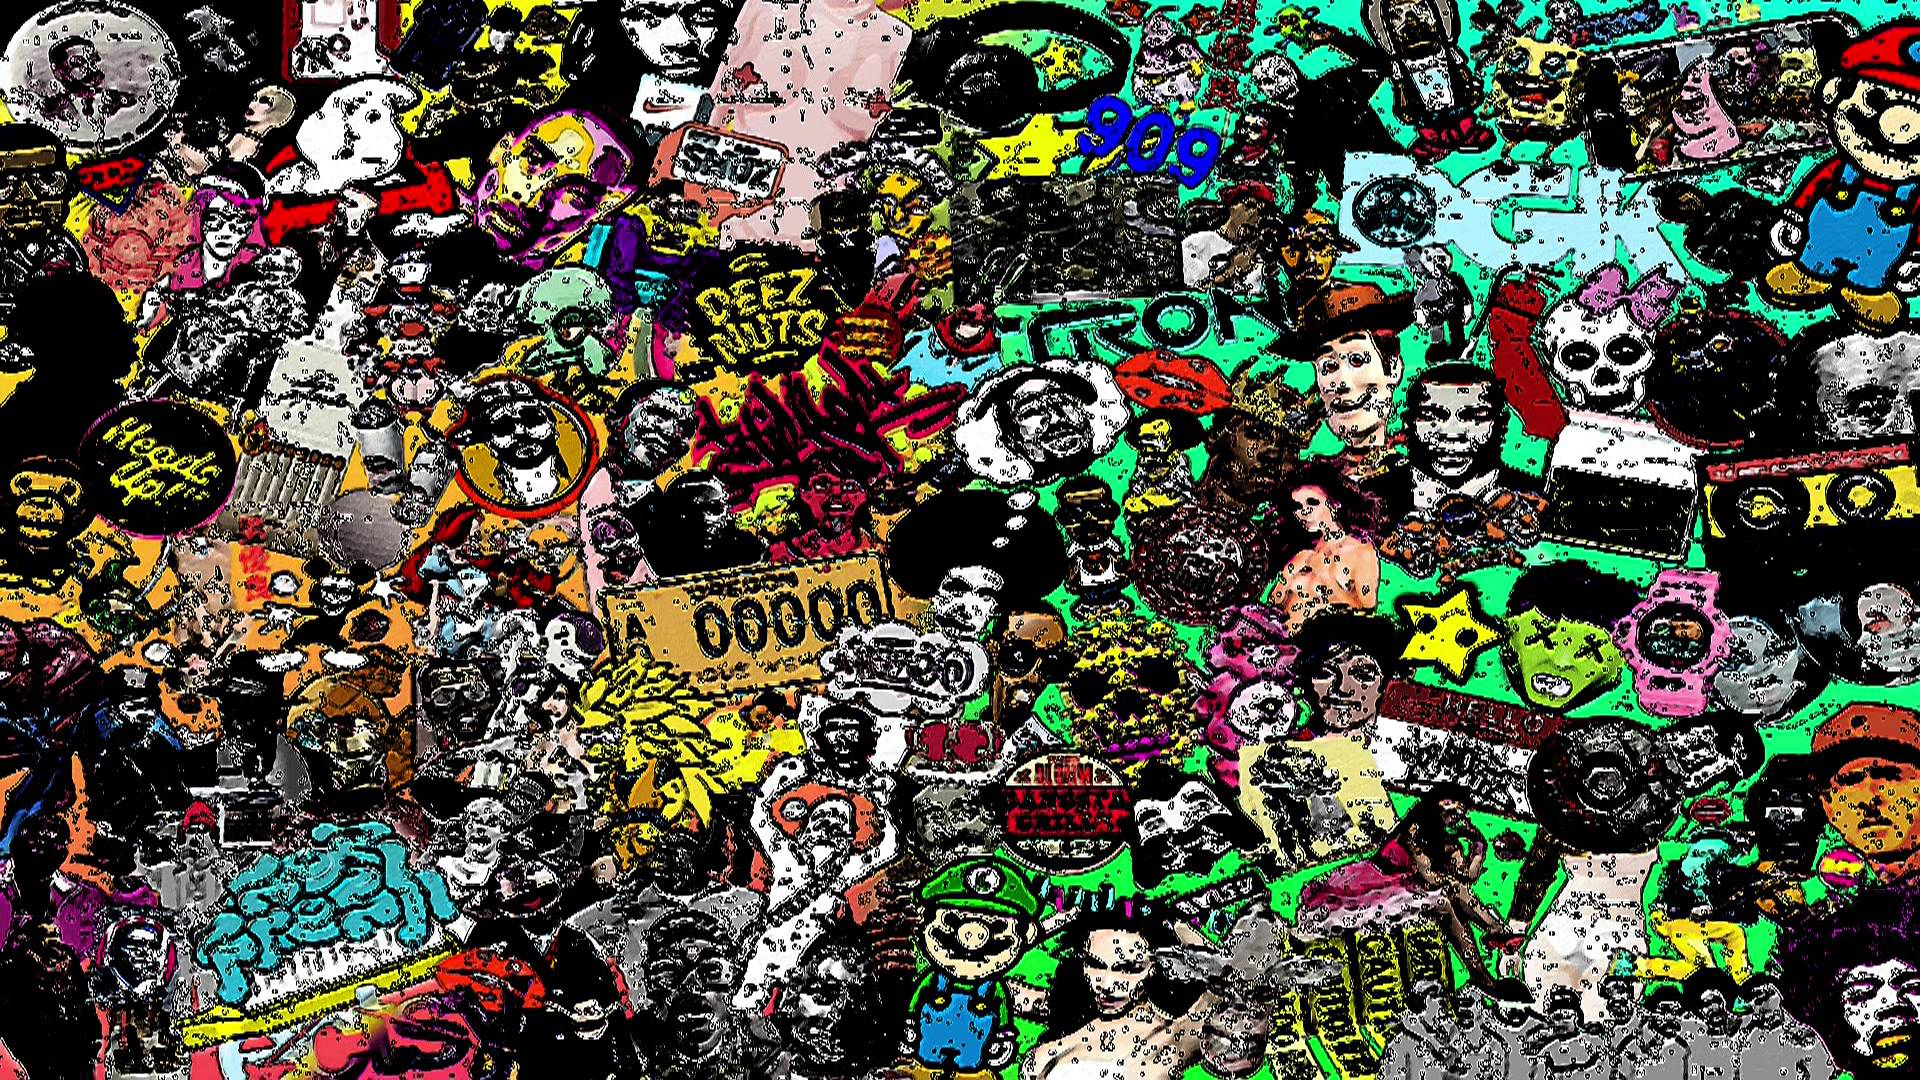 Download Hd Wallpapers Of Inspirational Quotes Rap Images Free Download Pixelstalk Net